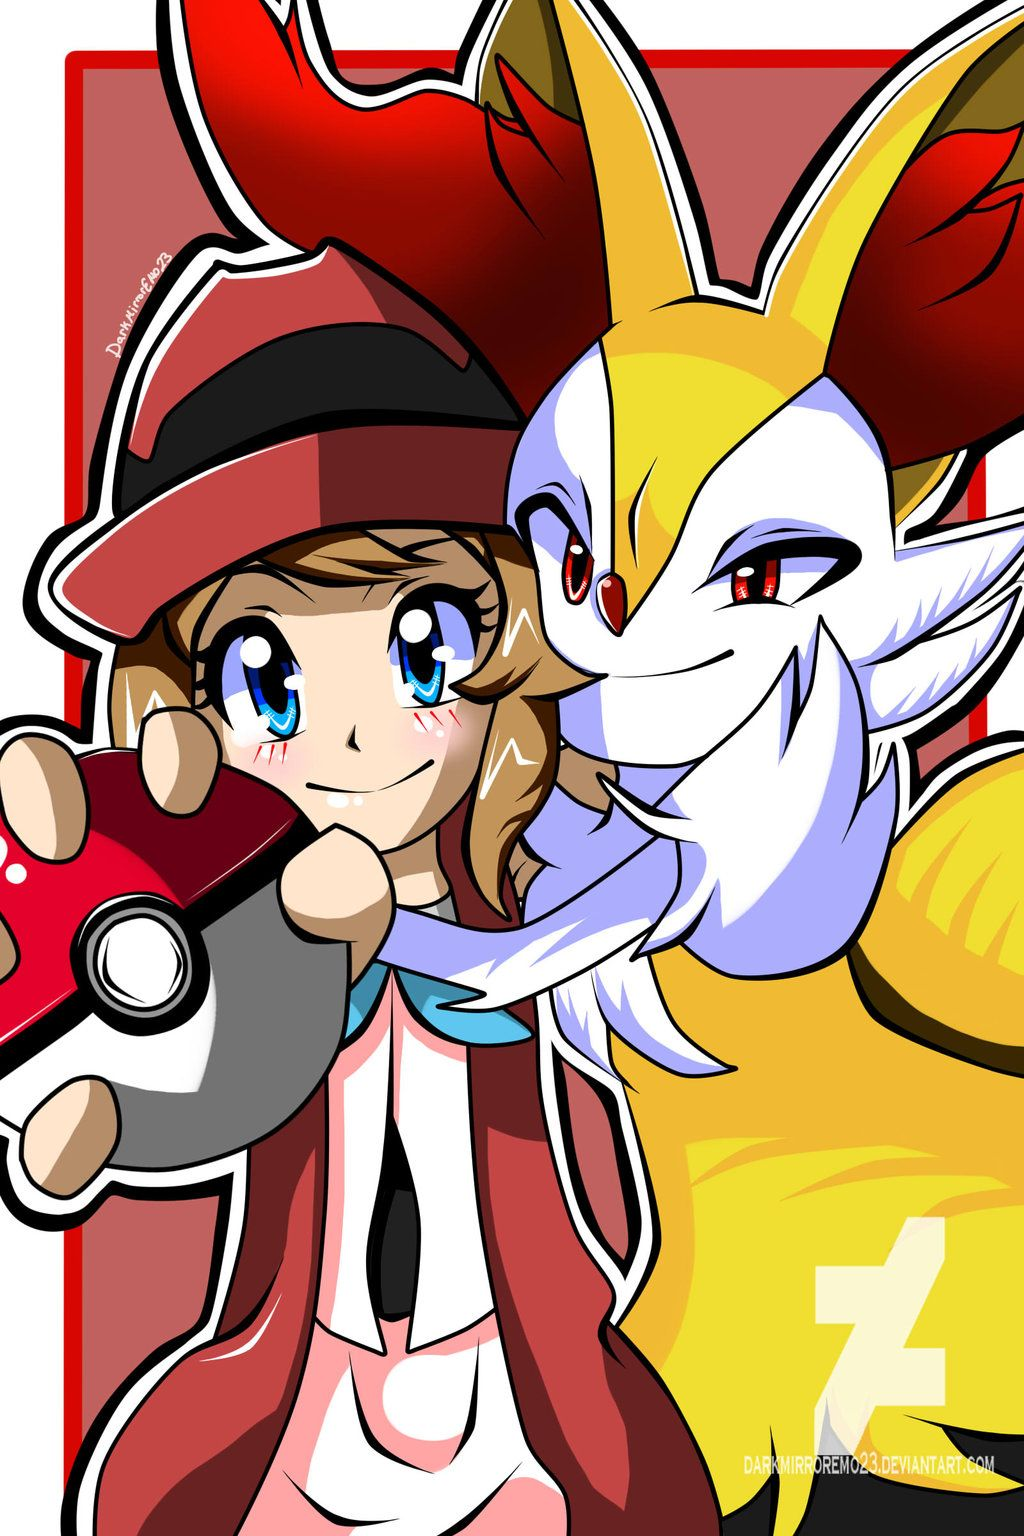 Pin by rollinggirl on pokemon pinterest pokémon and anime